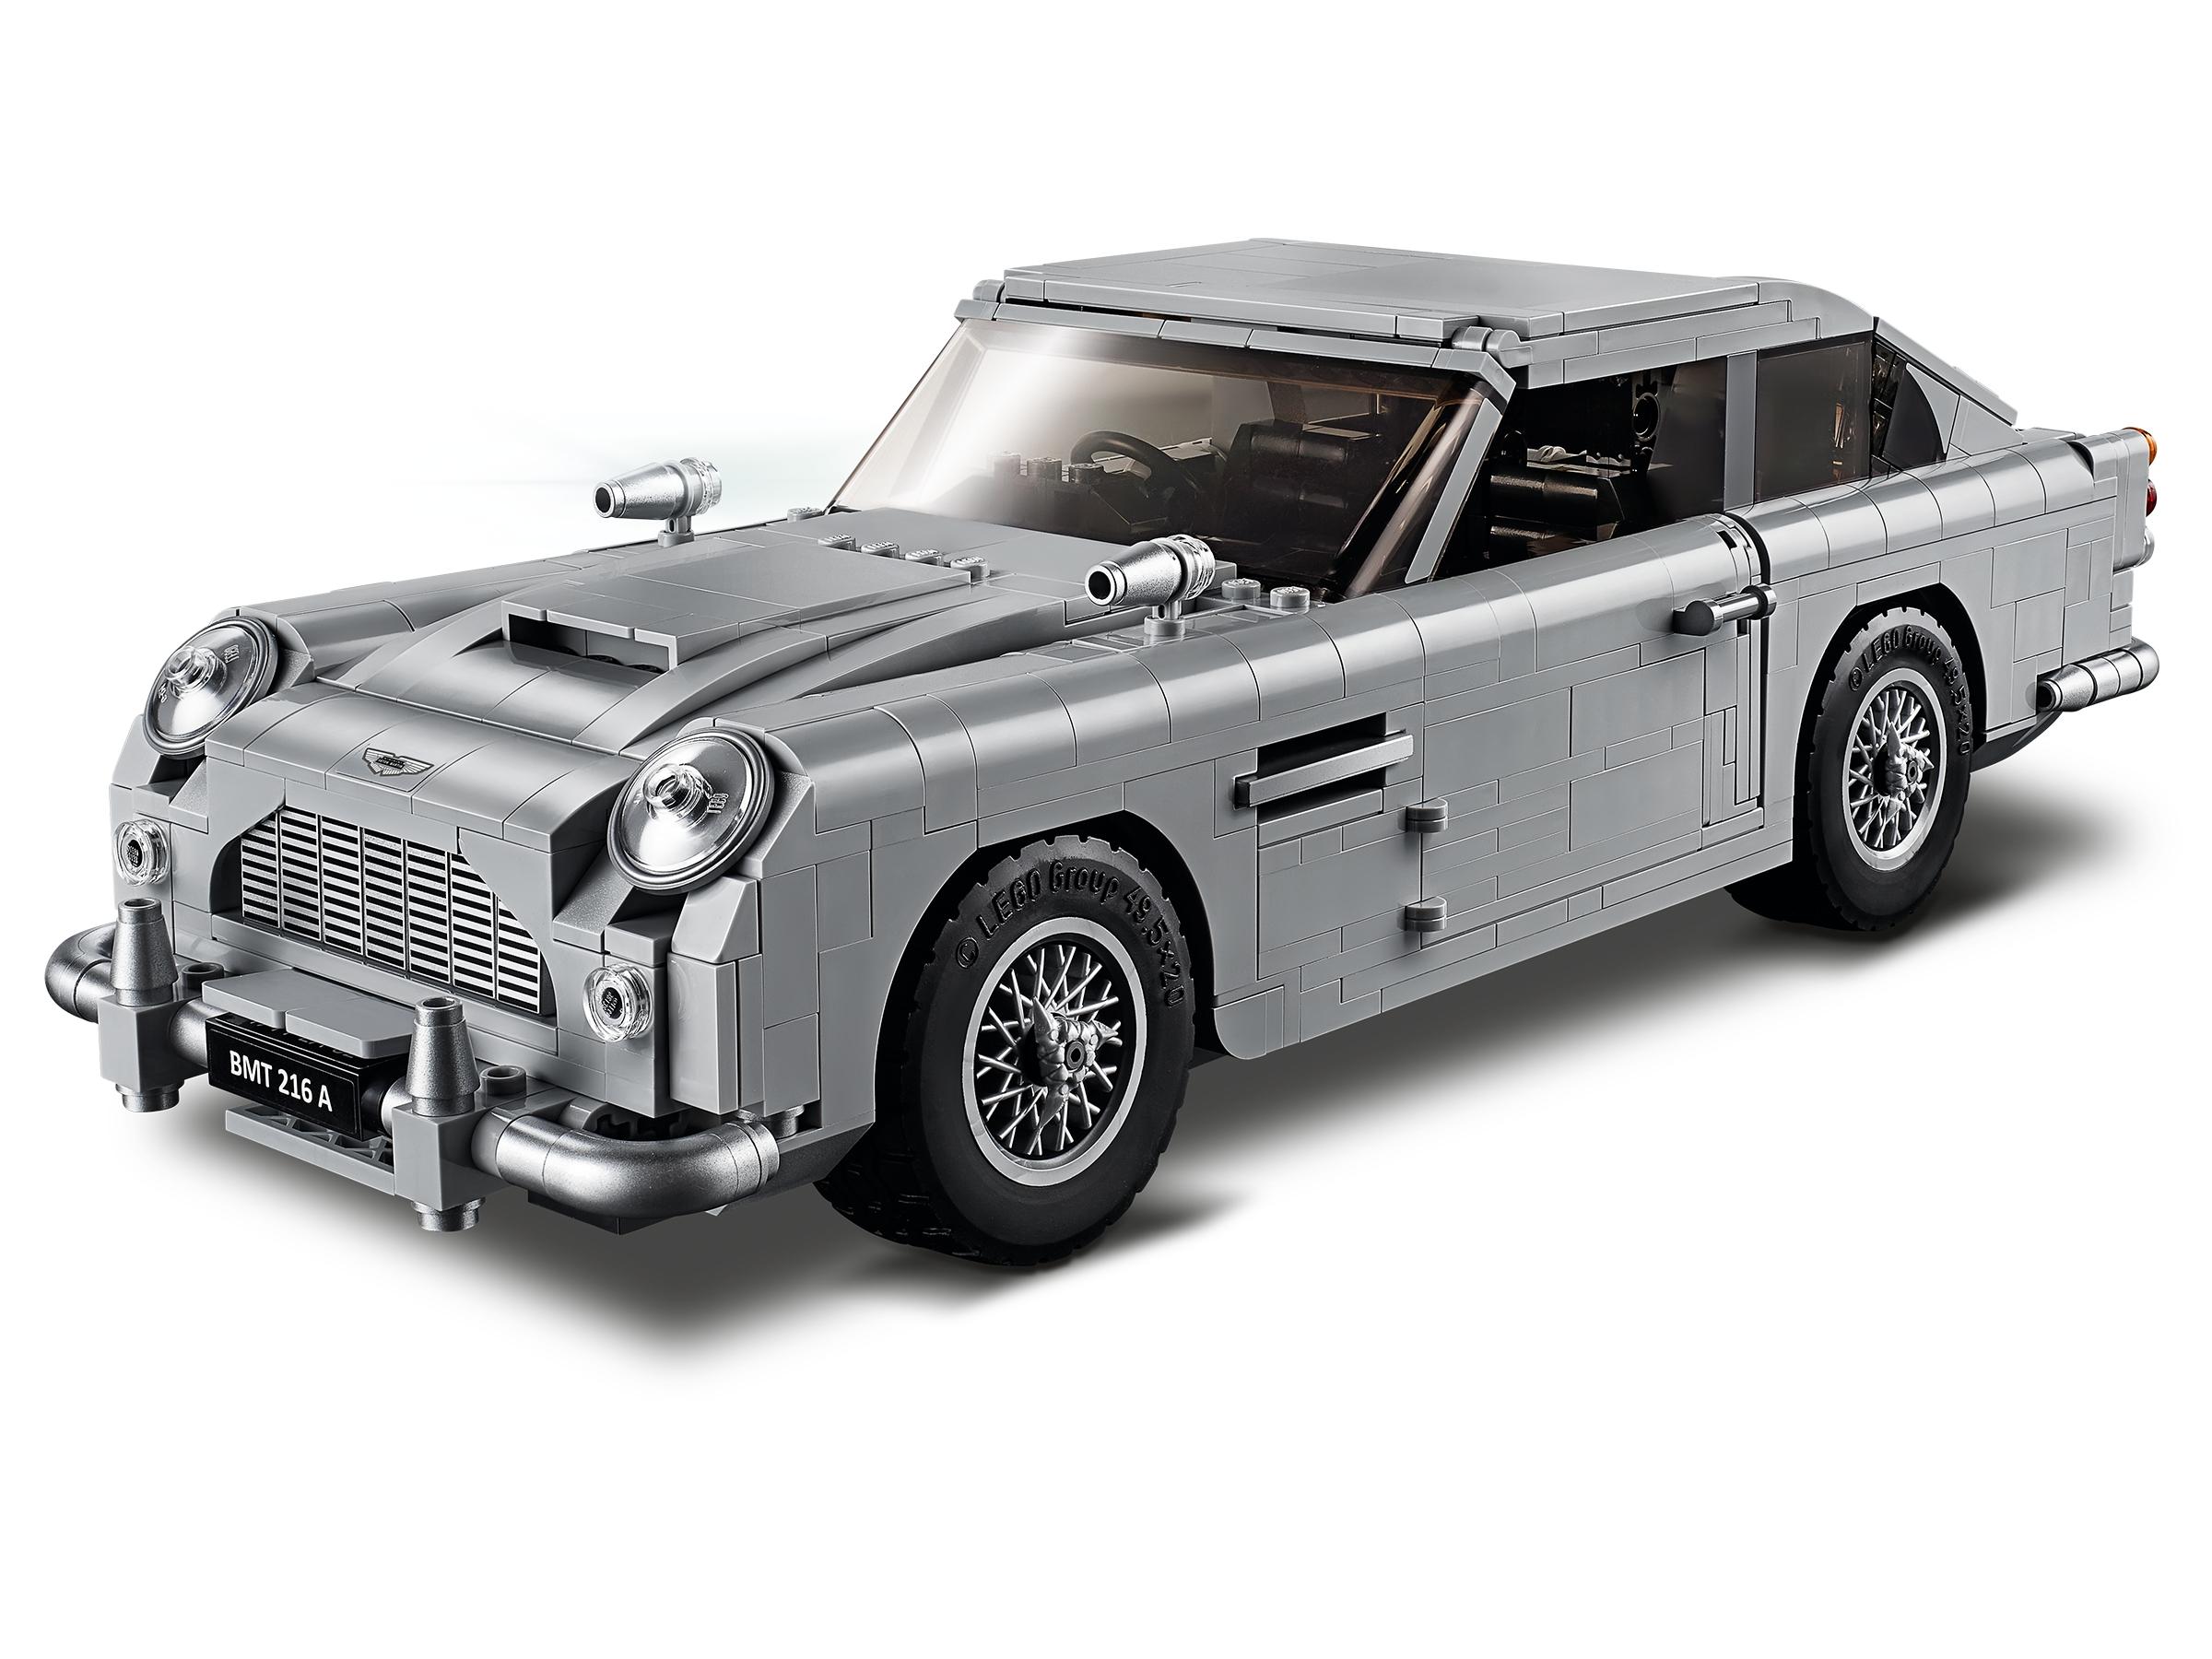 James Bond Aston Martin Db5 10262 Creator Expert Buy Online At The Official Lego Shop Gb